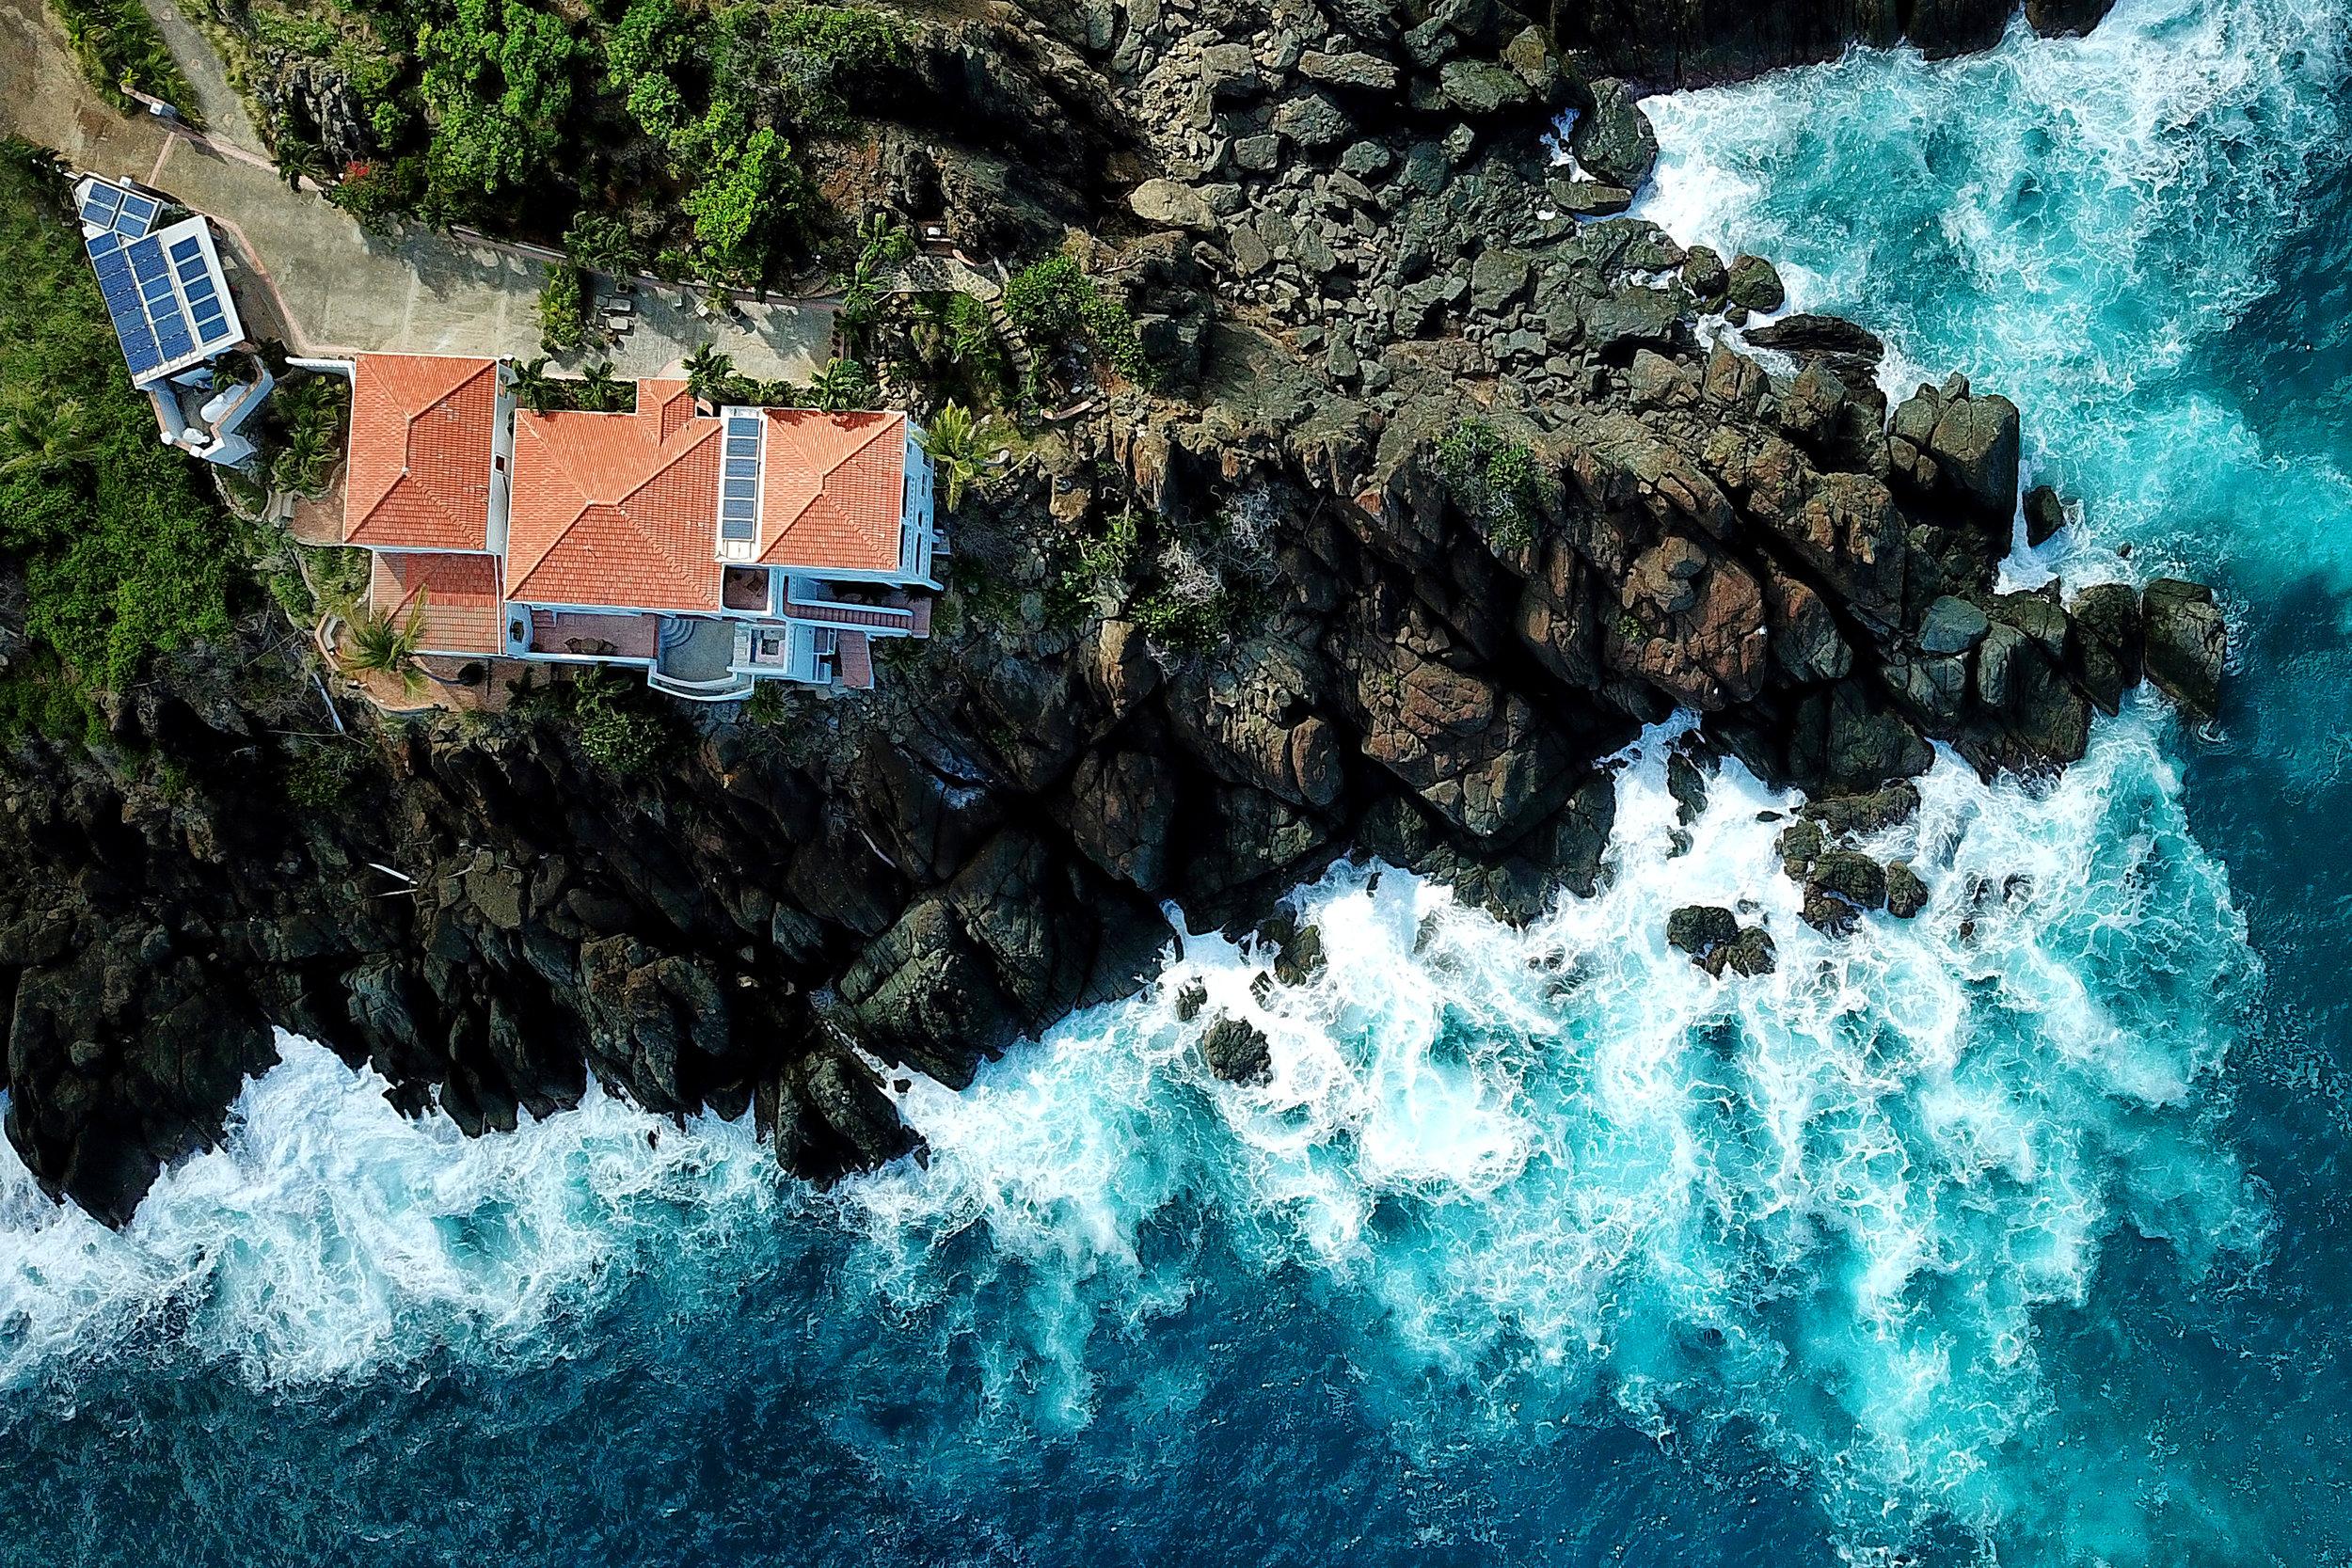 Norbu Accommodations - Villa Rentals in the USVI